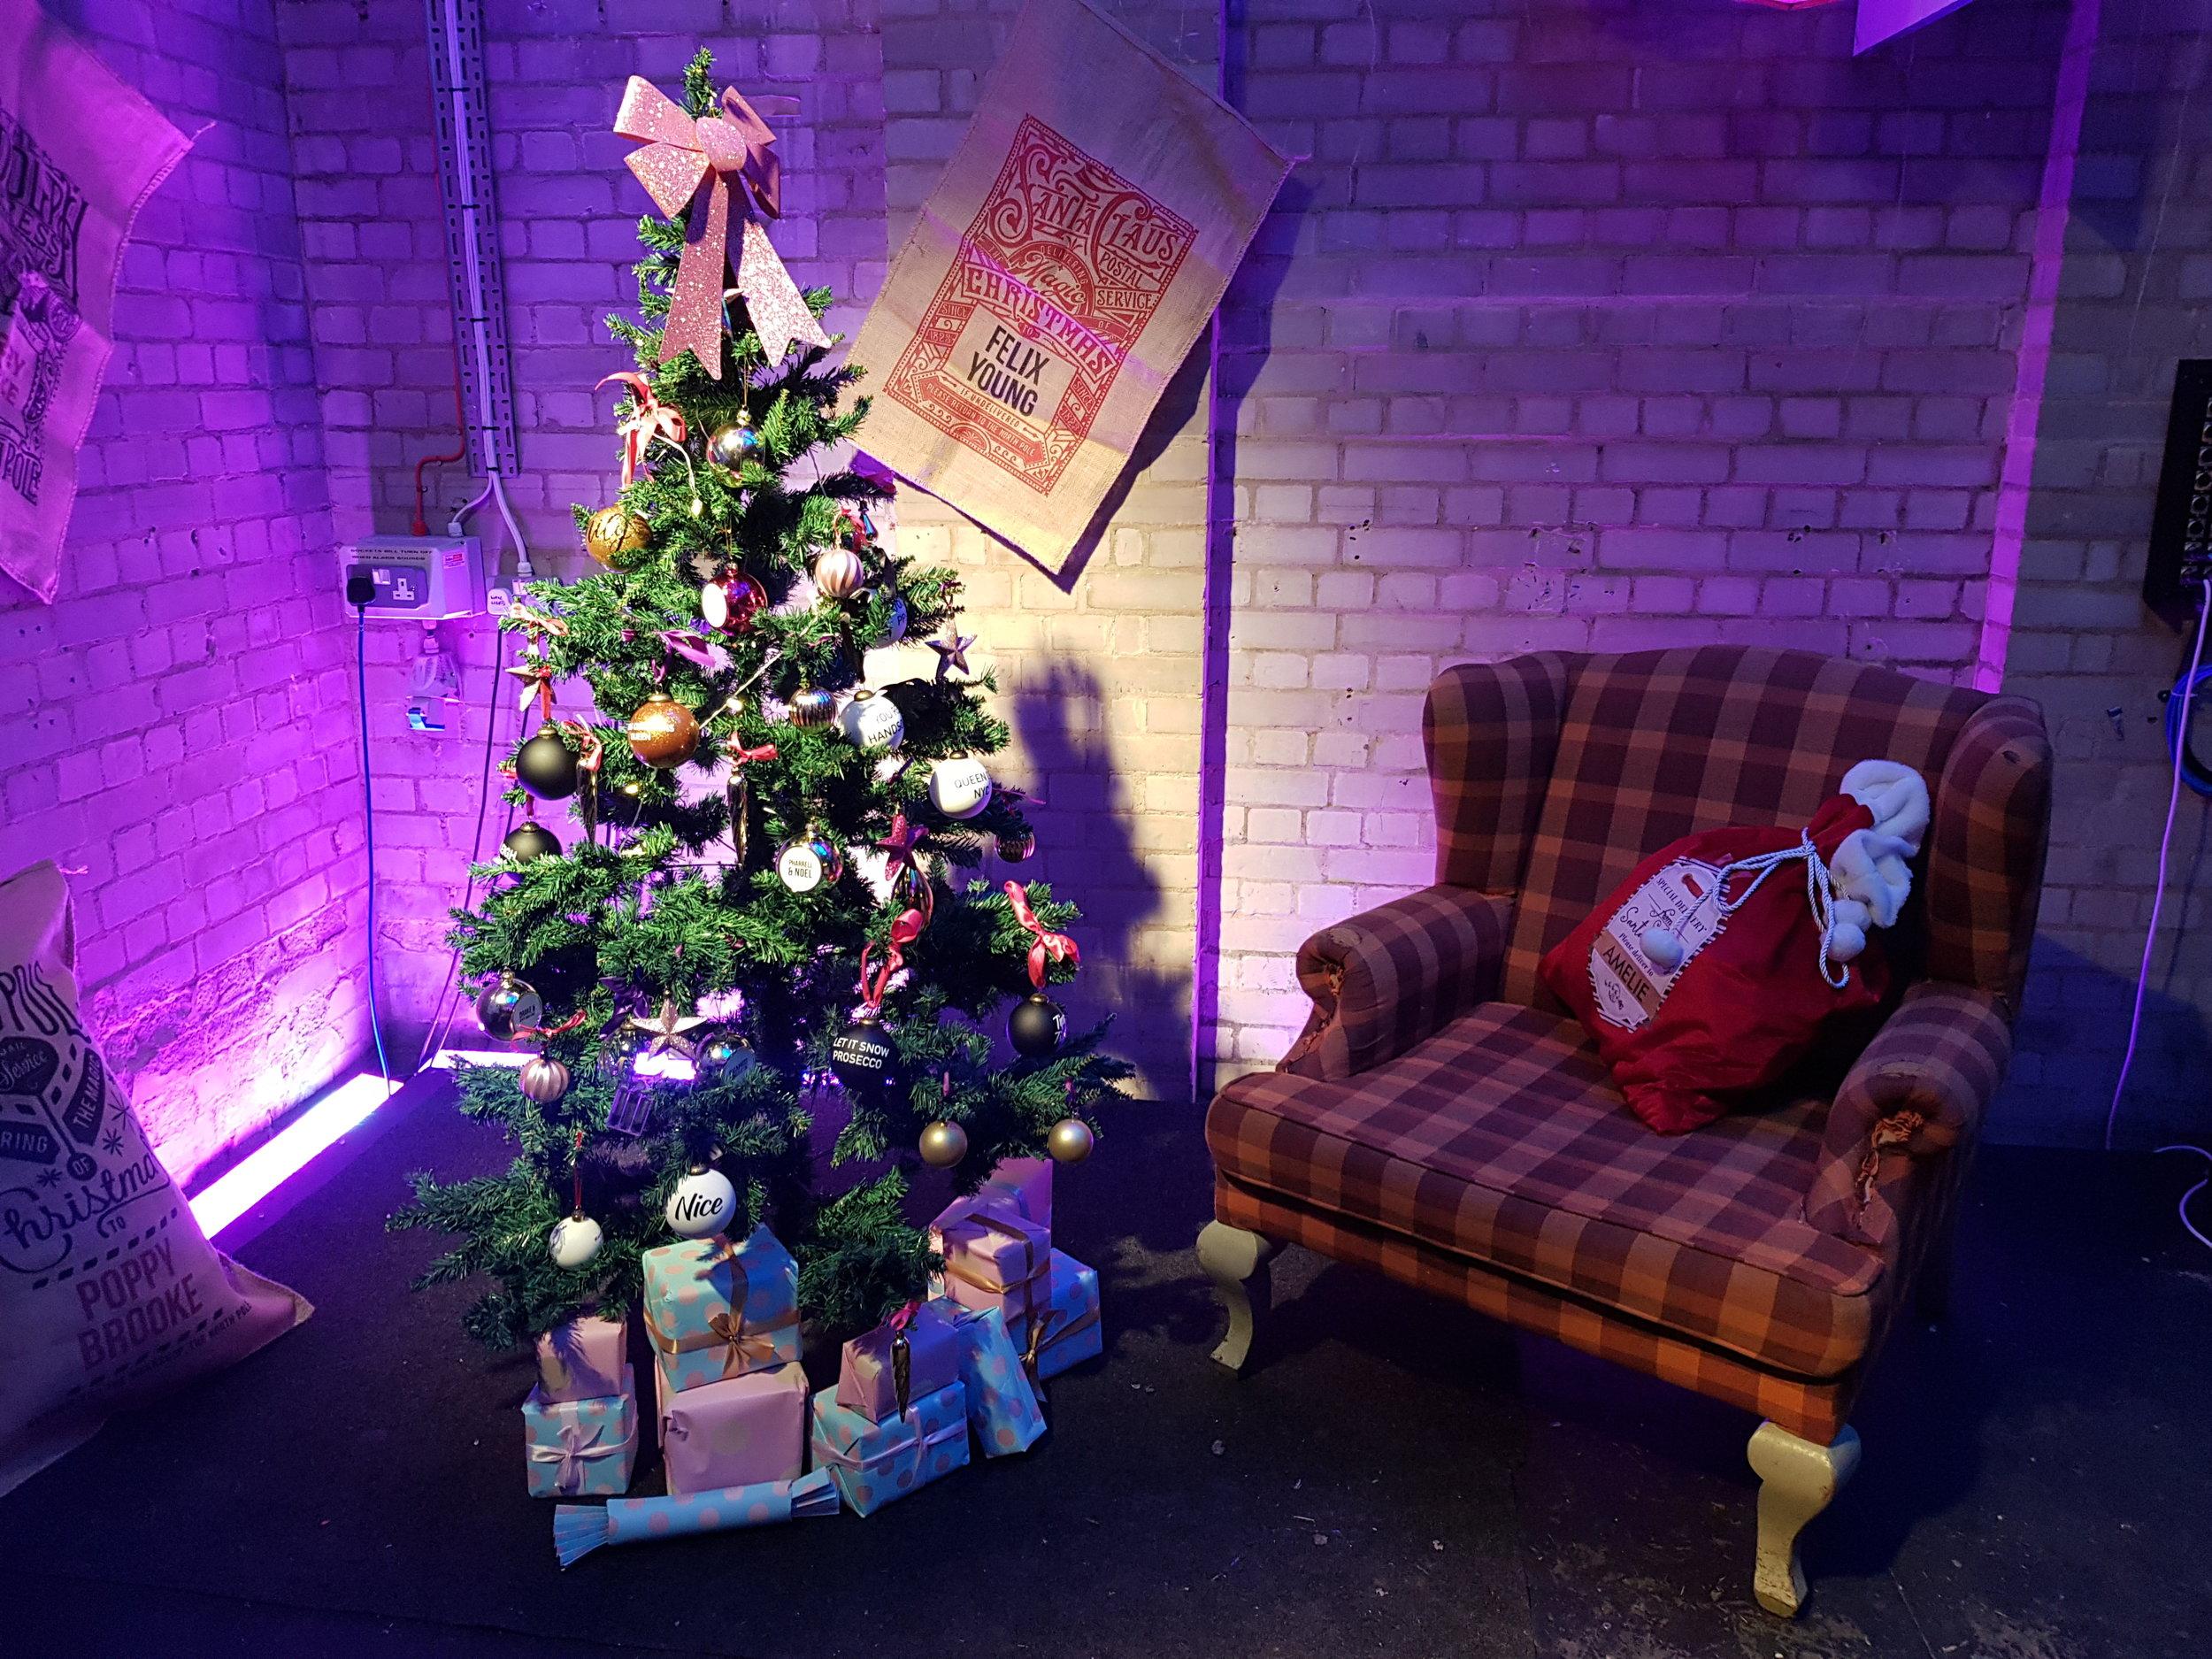 Prezzybox Jingle Mingle personalised Christmas sacks